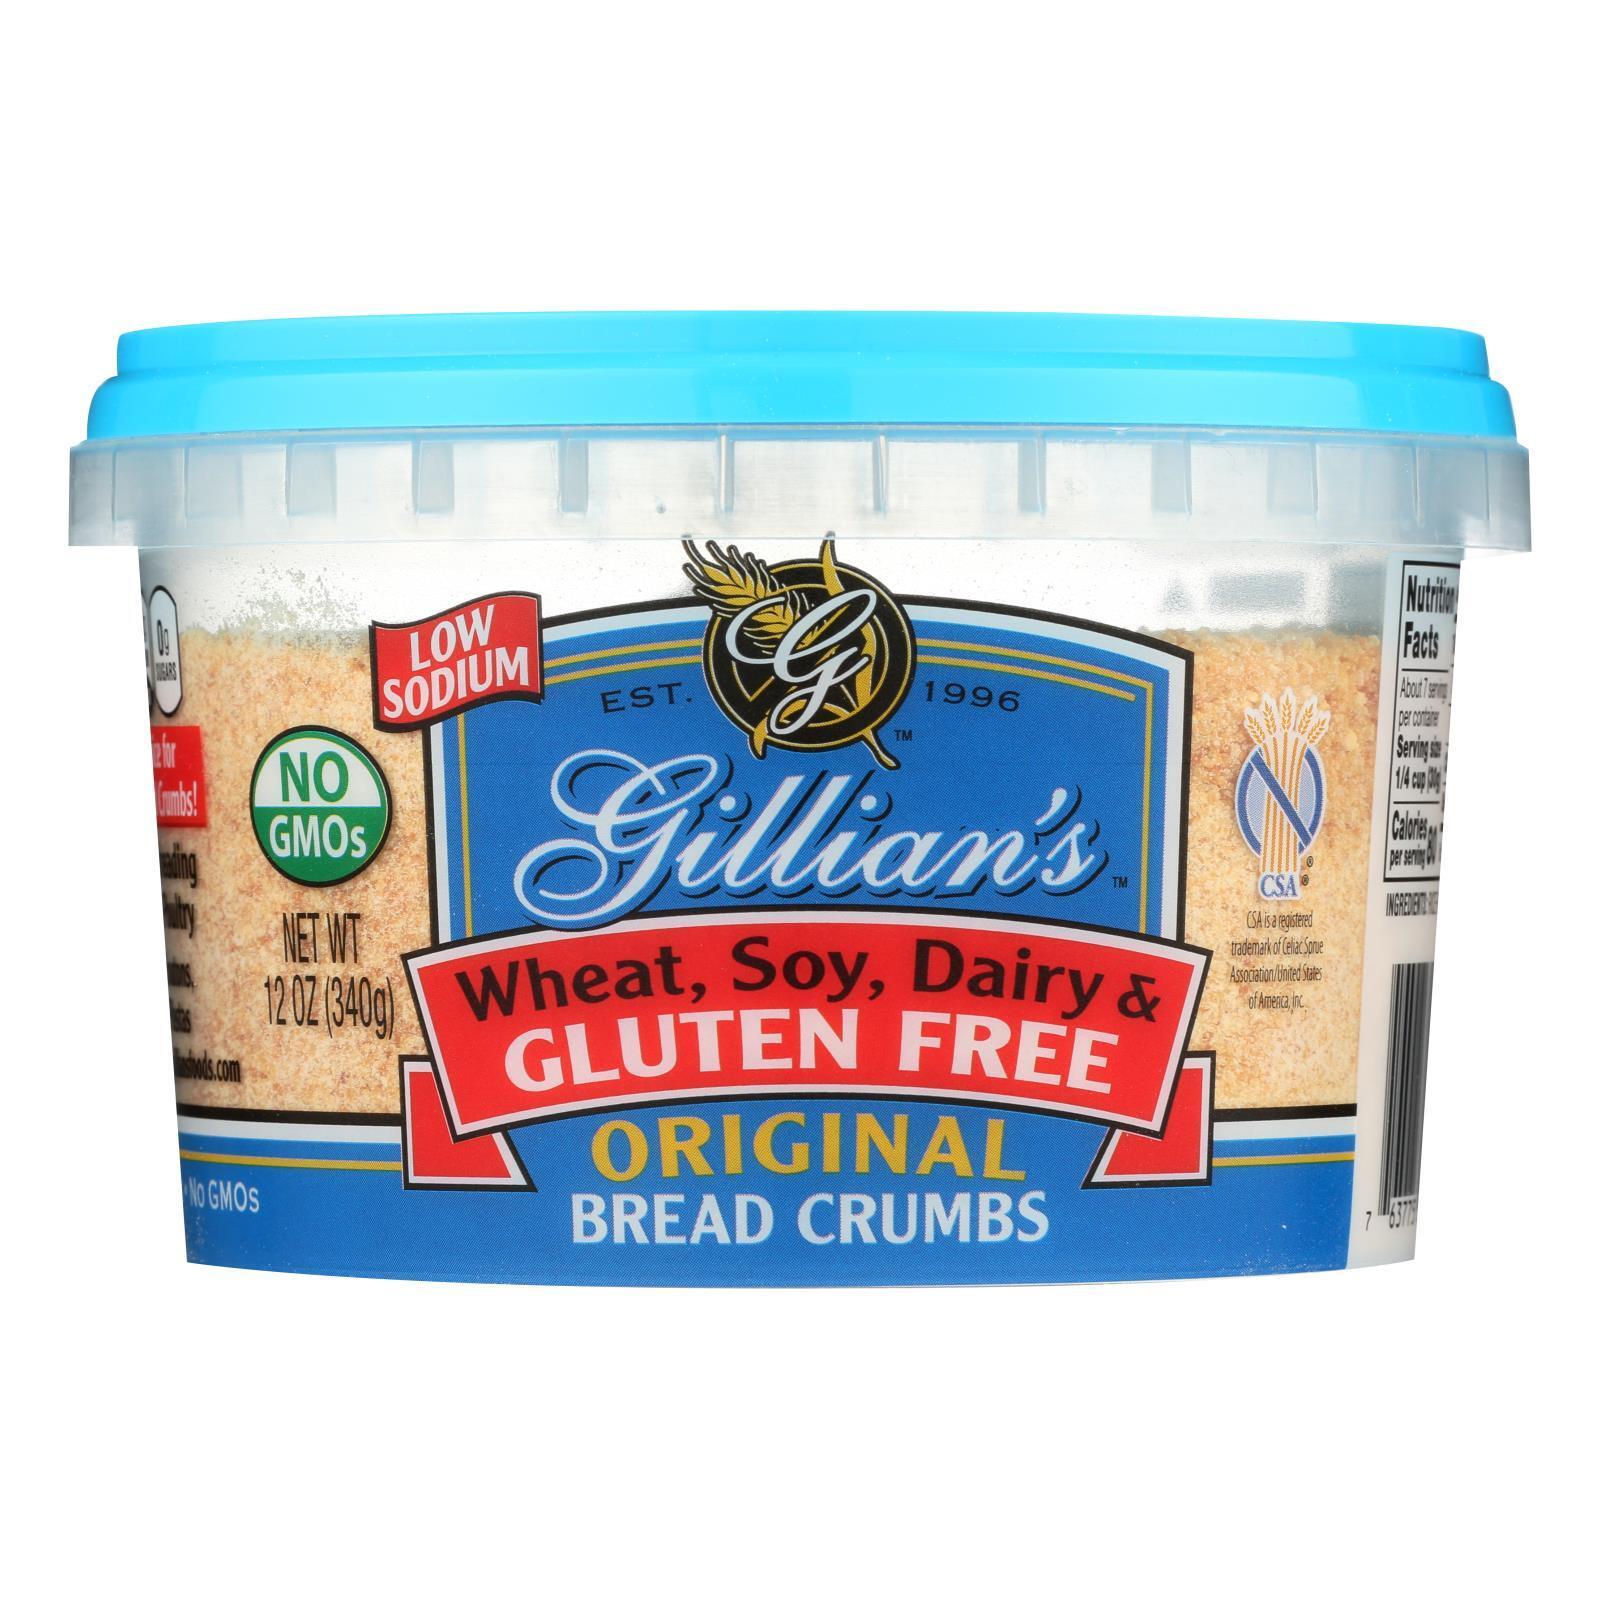 Gillian's Food Plain Bread Crumbs - Original - Case of 12 - 12 oz.